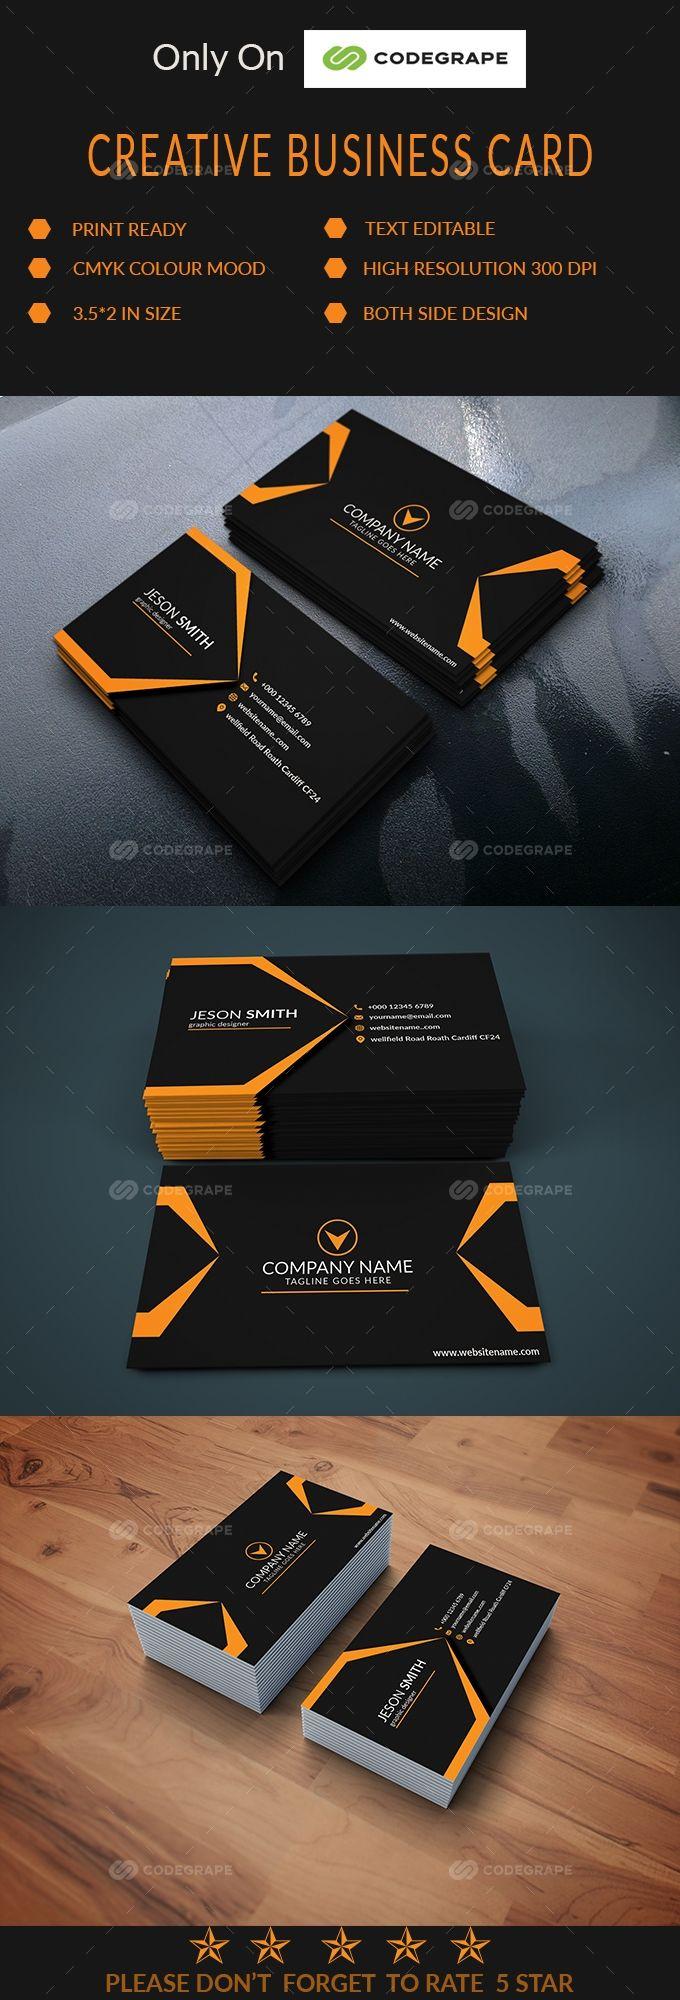 Corporate Business Card Corporate Business Card Printing Business Cards Business Cards Creative